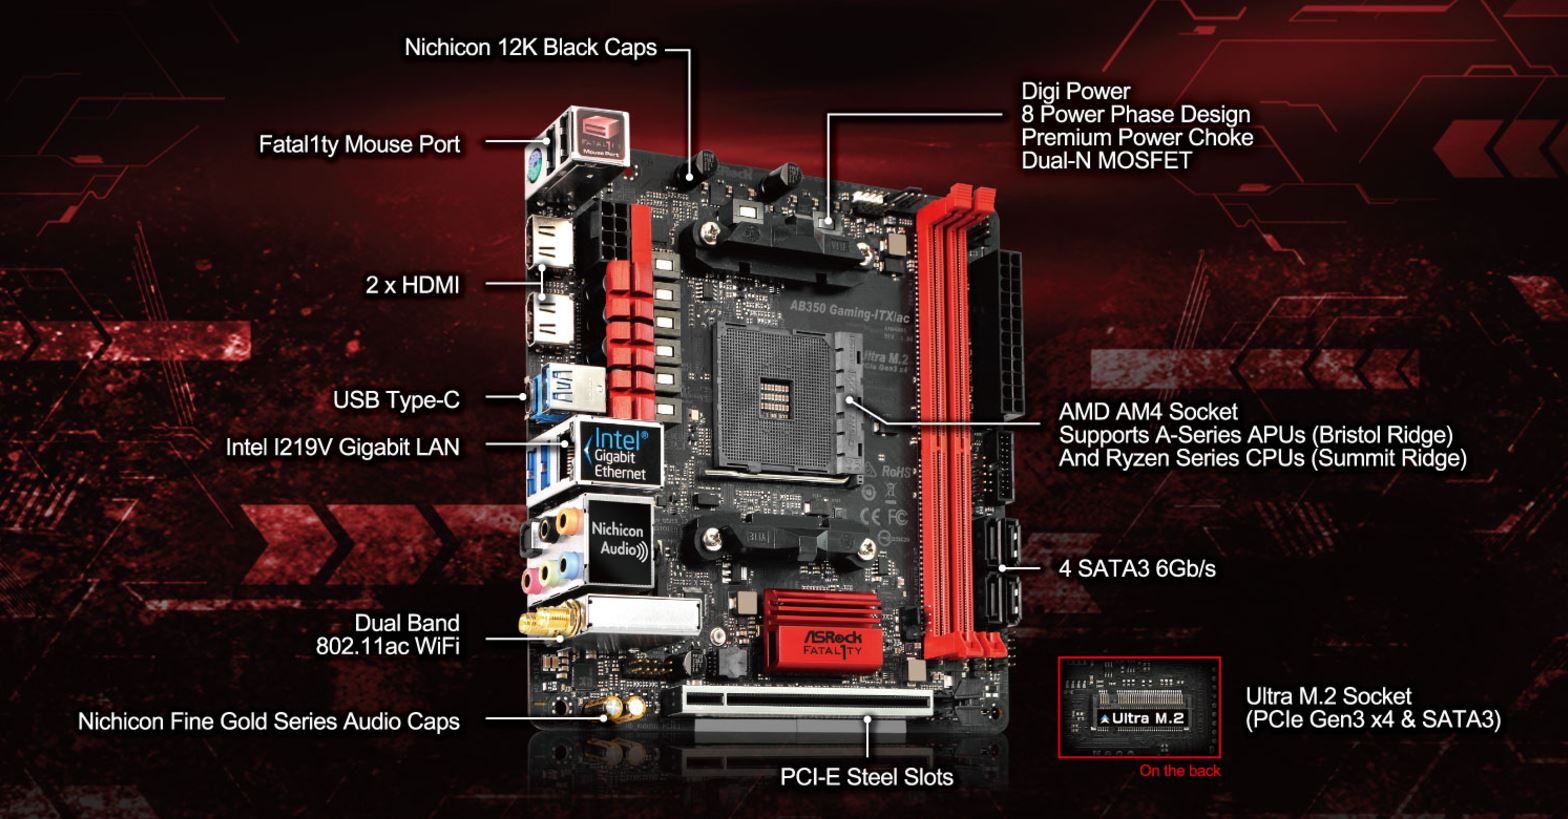 ASRock Fatal1ty AB350 Gaming ITX fea 0